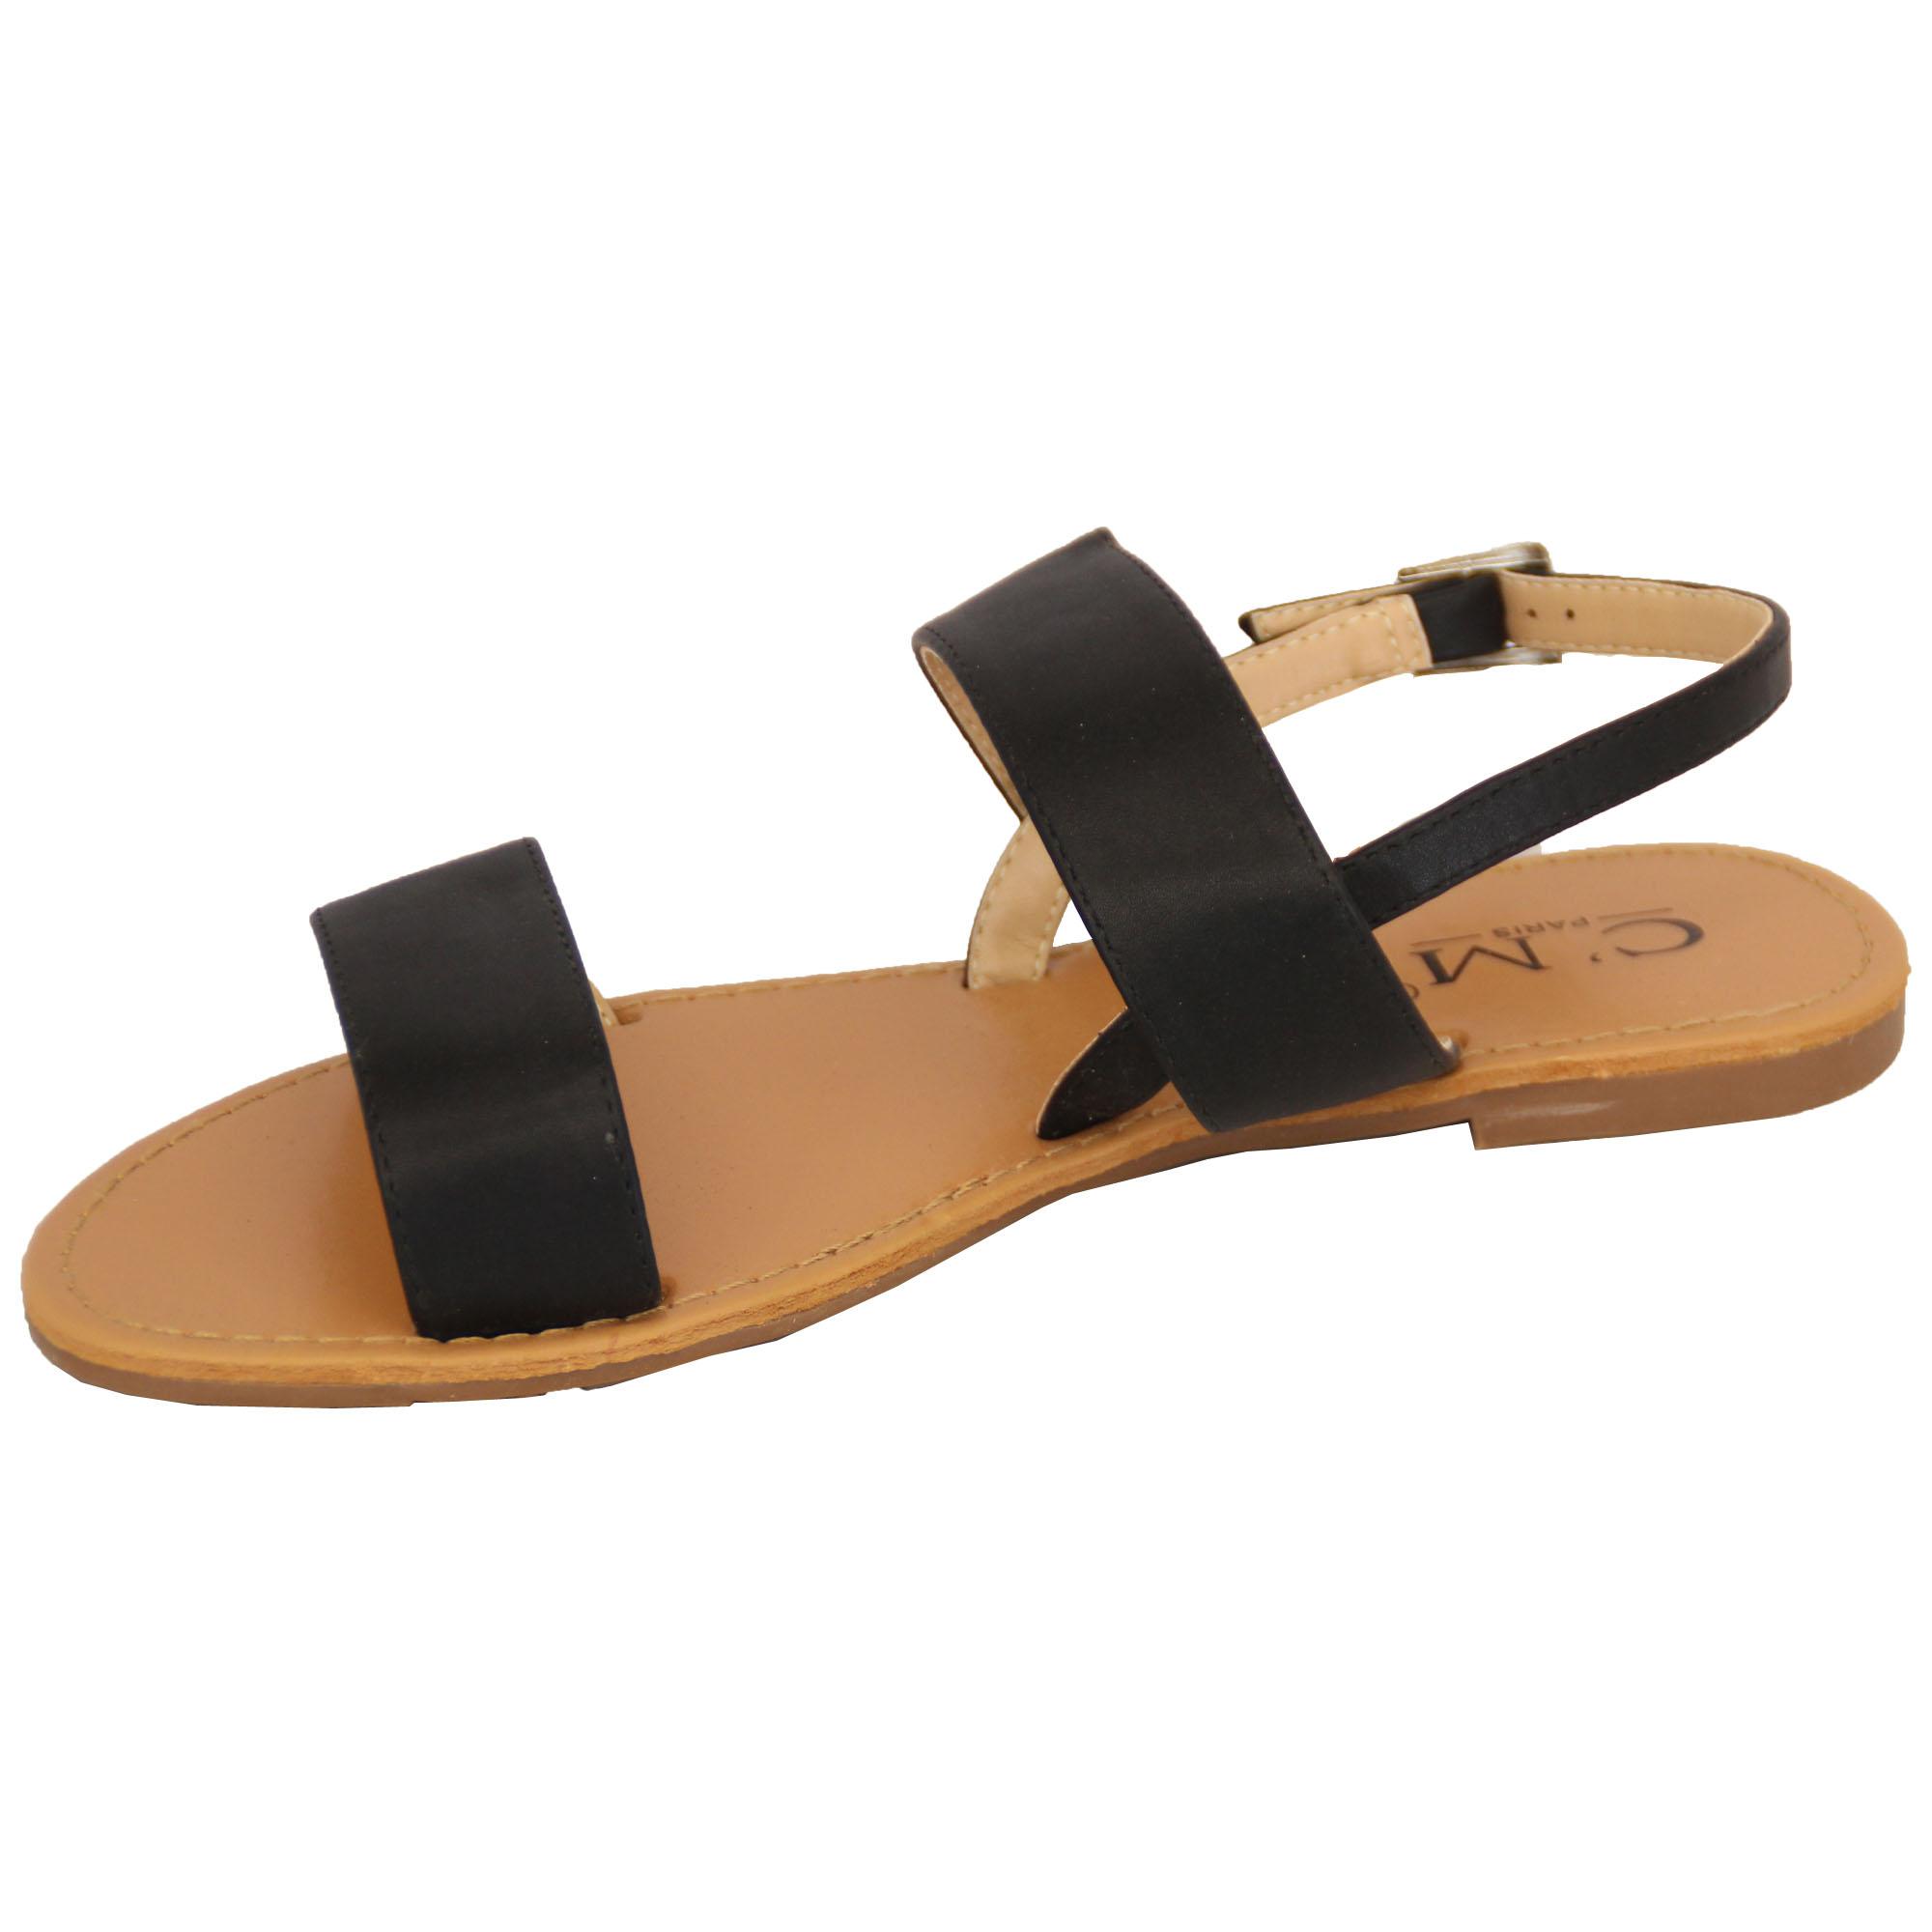 5d429fa53d0 Ladies Flat Sandals Womens Open Toe Double Strap Buckle Casual ...